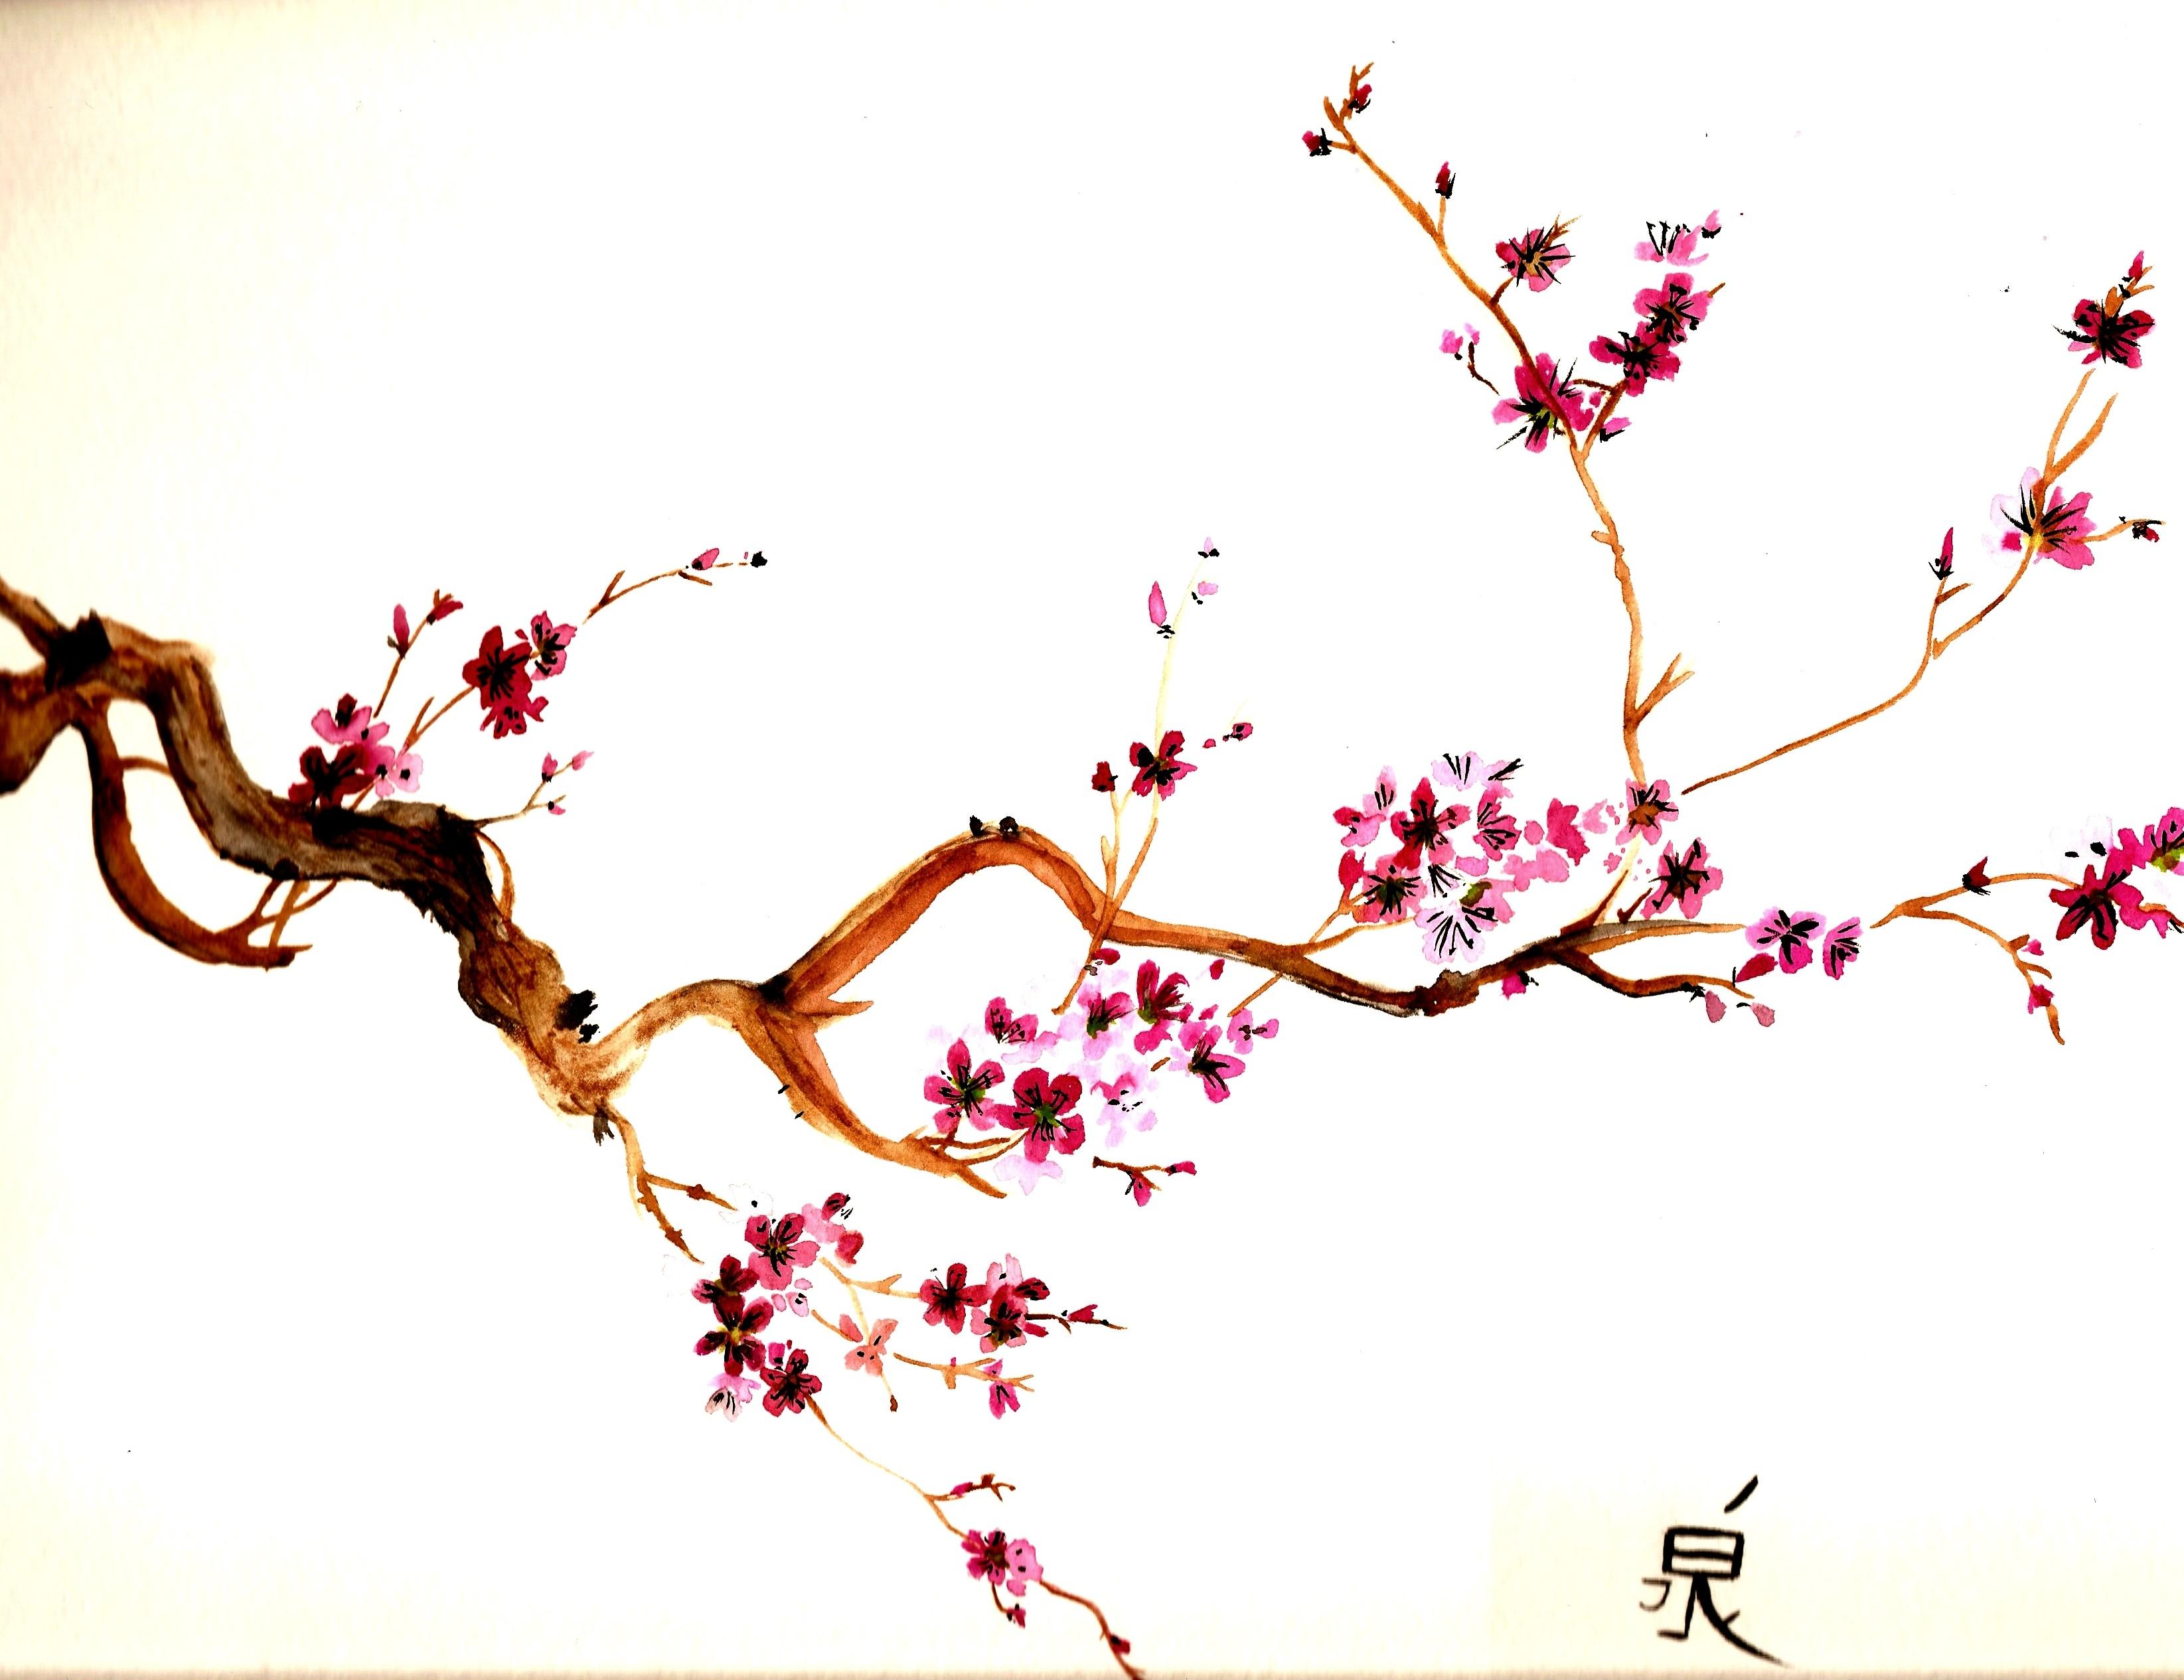 3290x2531 Drawn Cherry Blossom Sakura Tree